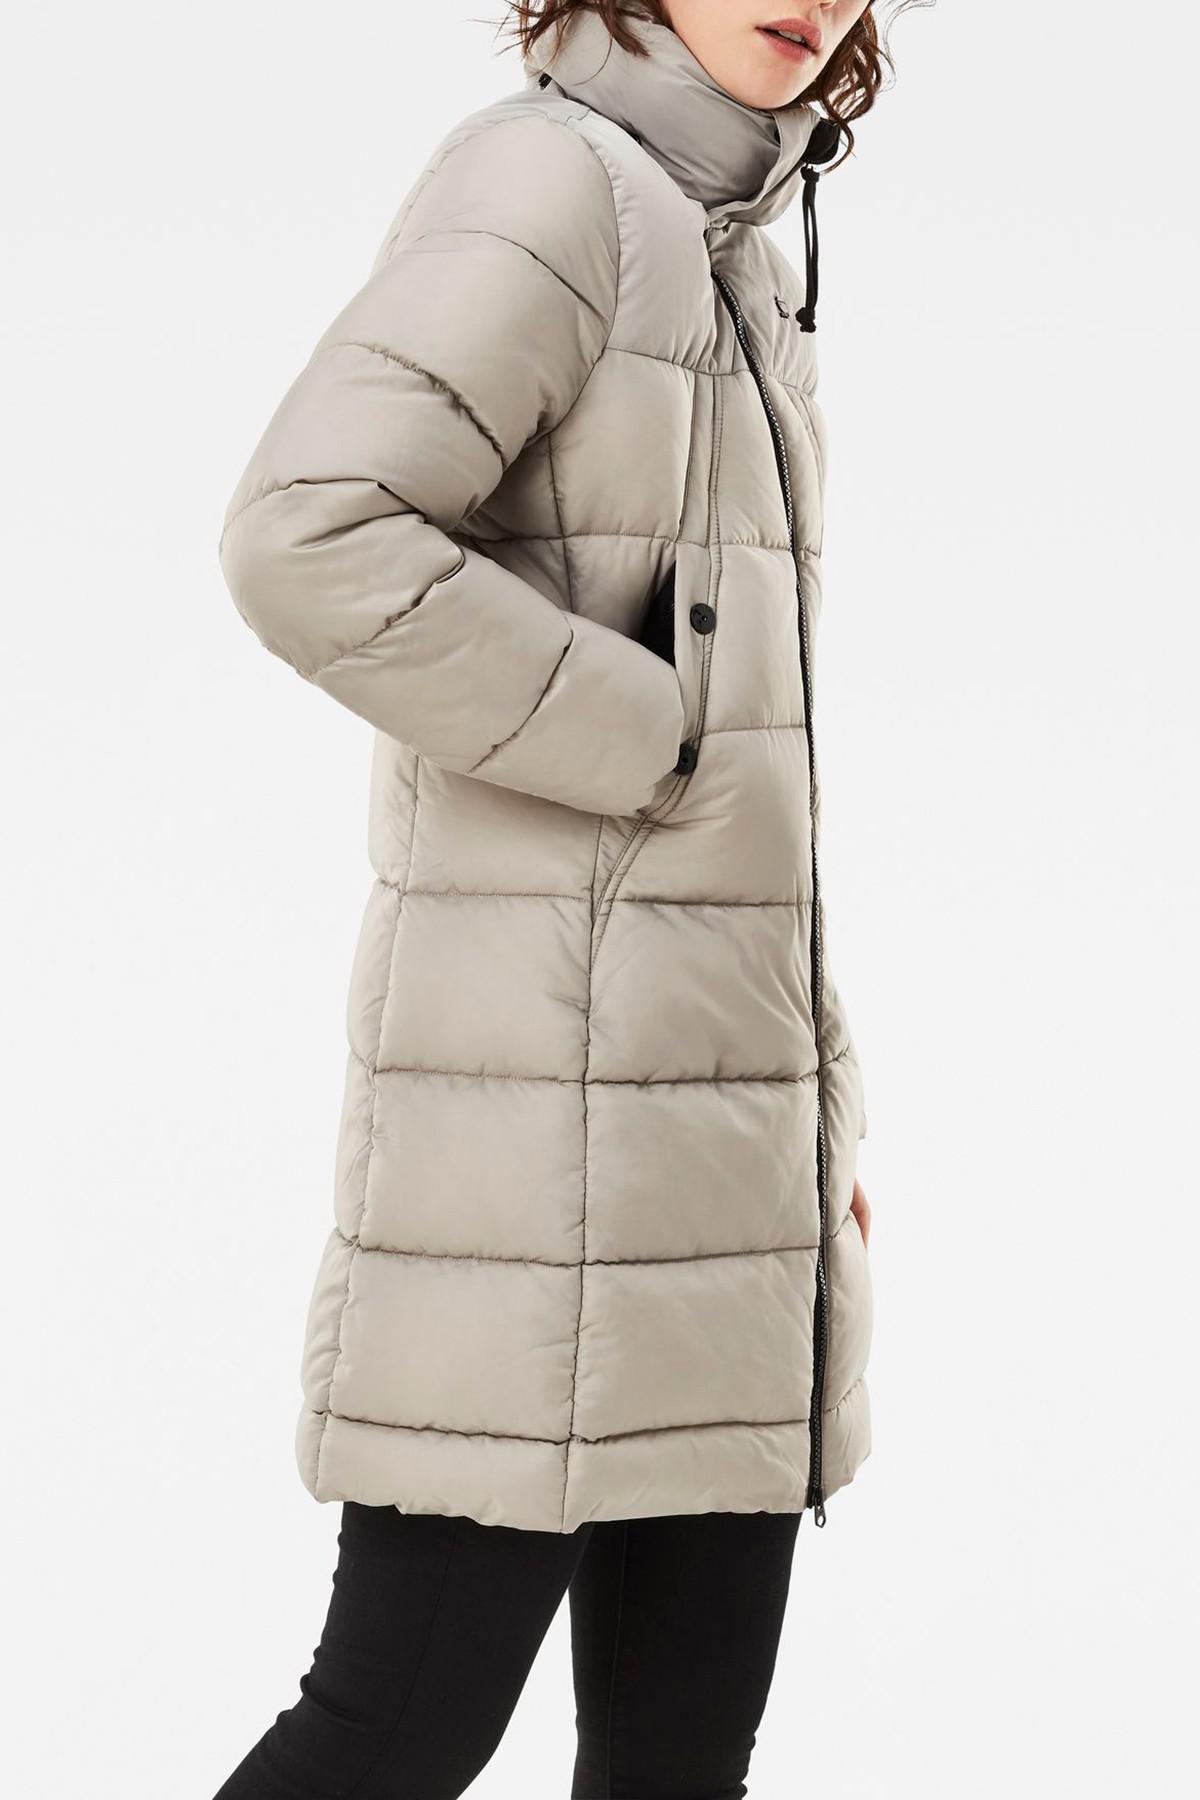 e16897a8d8a5 G-Star RAW Whistler Slim Hedley Coat Womens Jackets